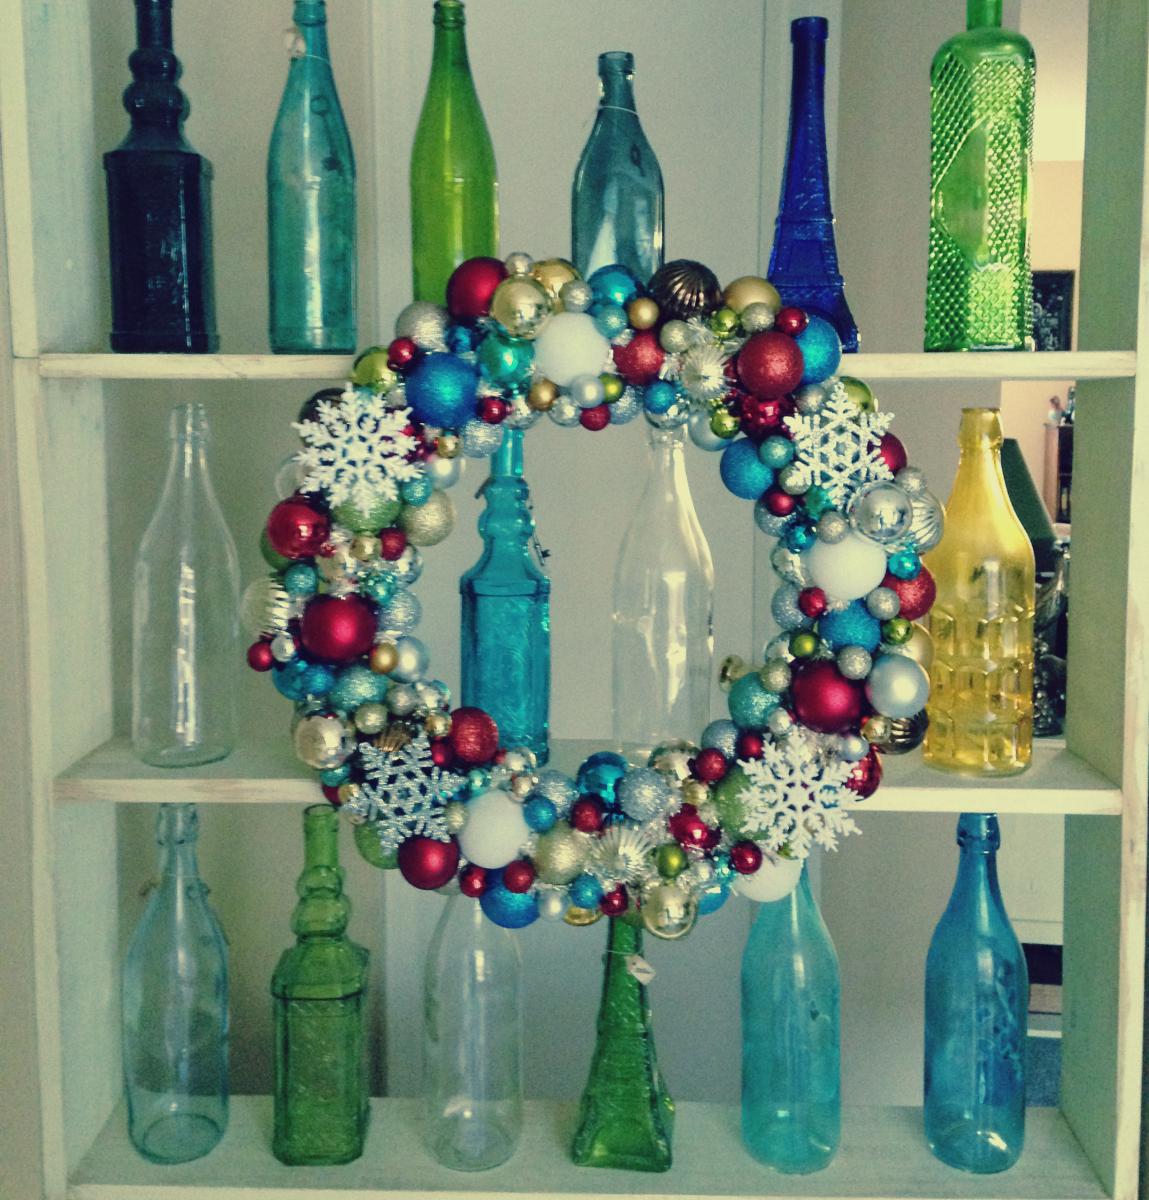 Easy to Make Christmas Wreaths